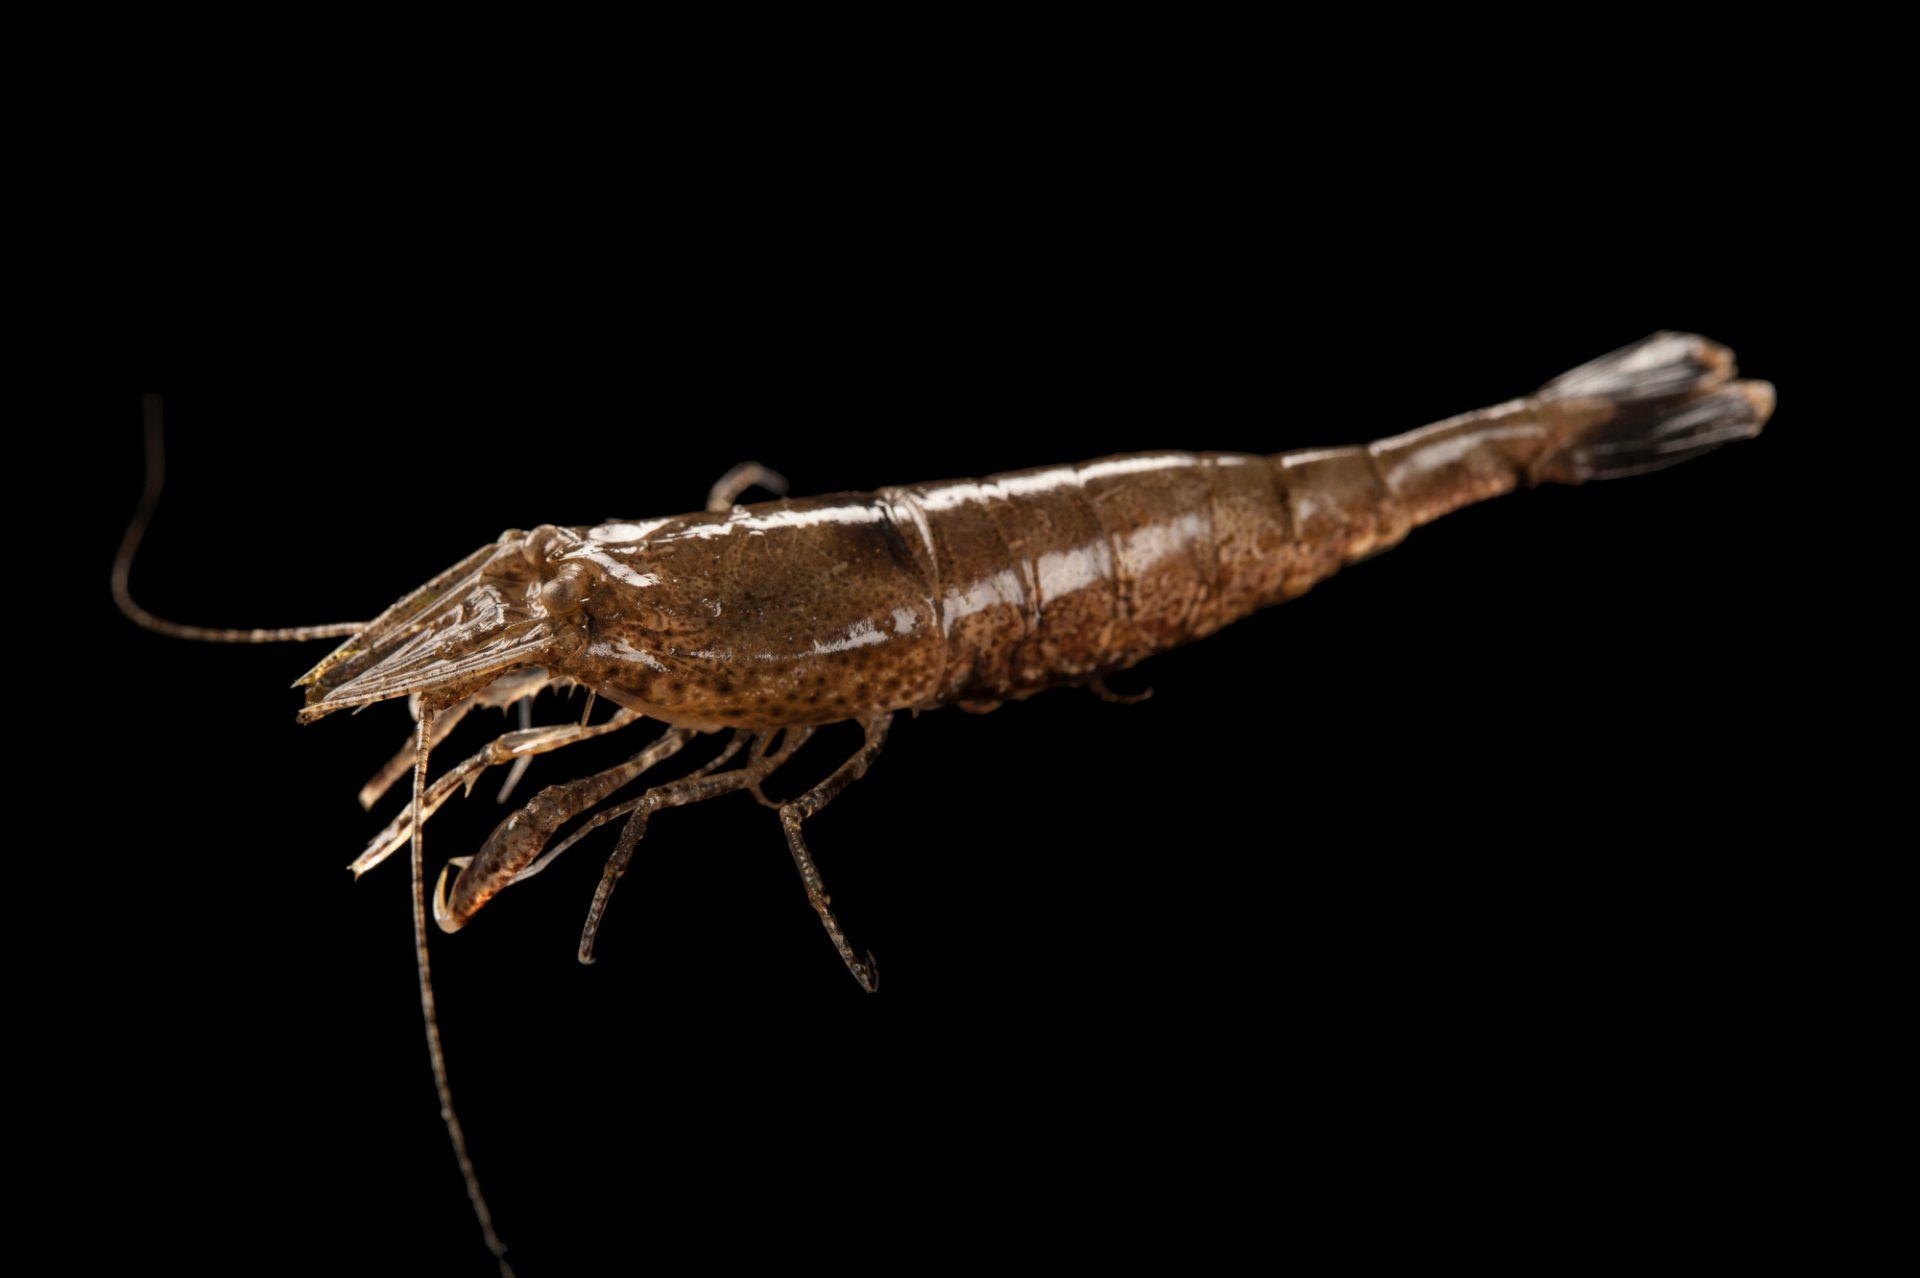 Sand shrimp, Crangon septemspinosa, at the Sedge Island Natural Resource Education Center in the Sedge Islands Marine Conservation Zone, Barnegat Bay, New Jersey.